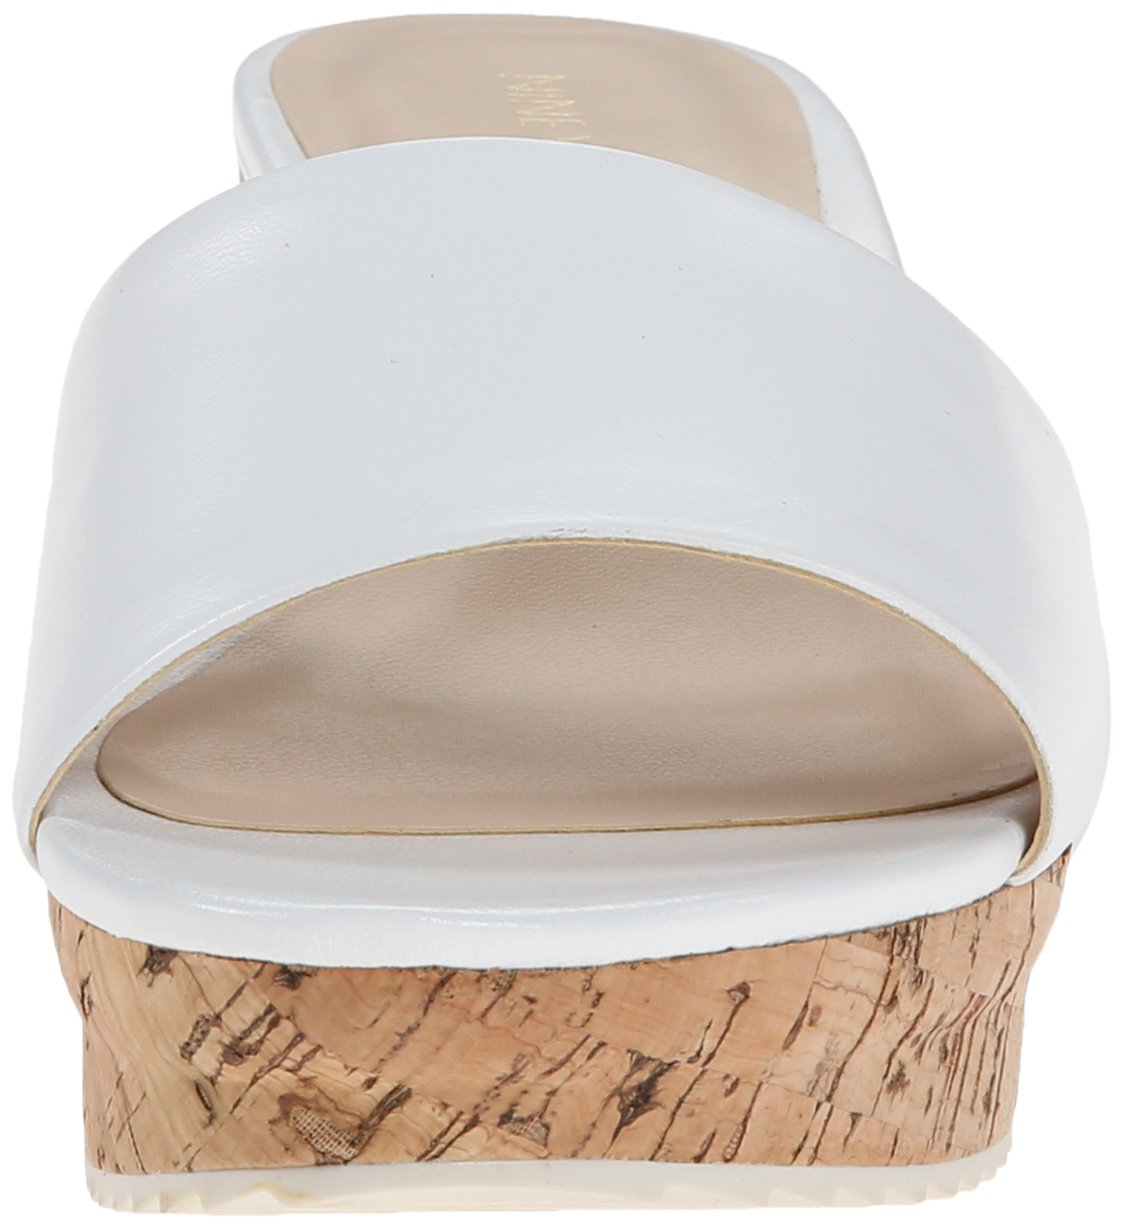 Nine West Women's Confetty Leather Platform US|Ivory Sandal B00QYZYE52 8 B(M) US|Ivory Platform 297306